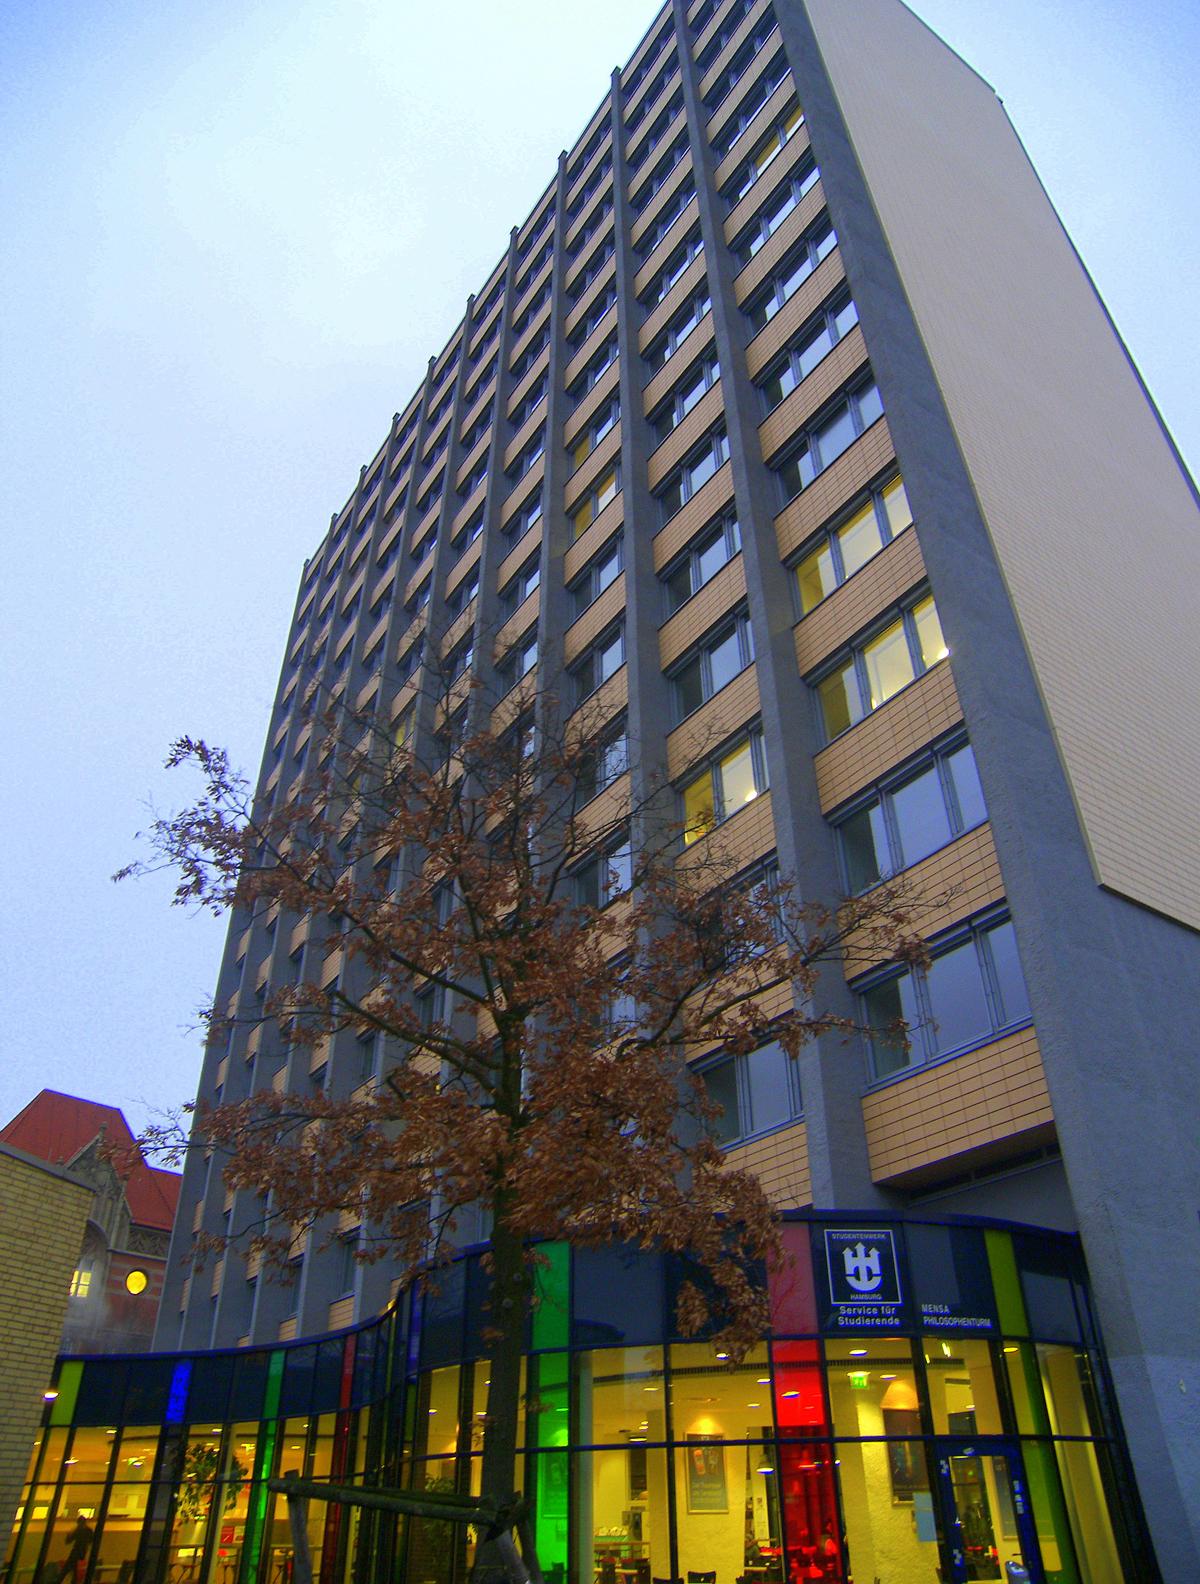 Philosophenturm wikipedia for Hamburg universitat